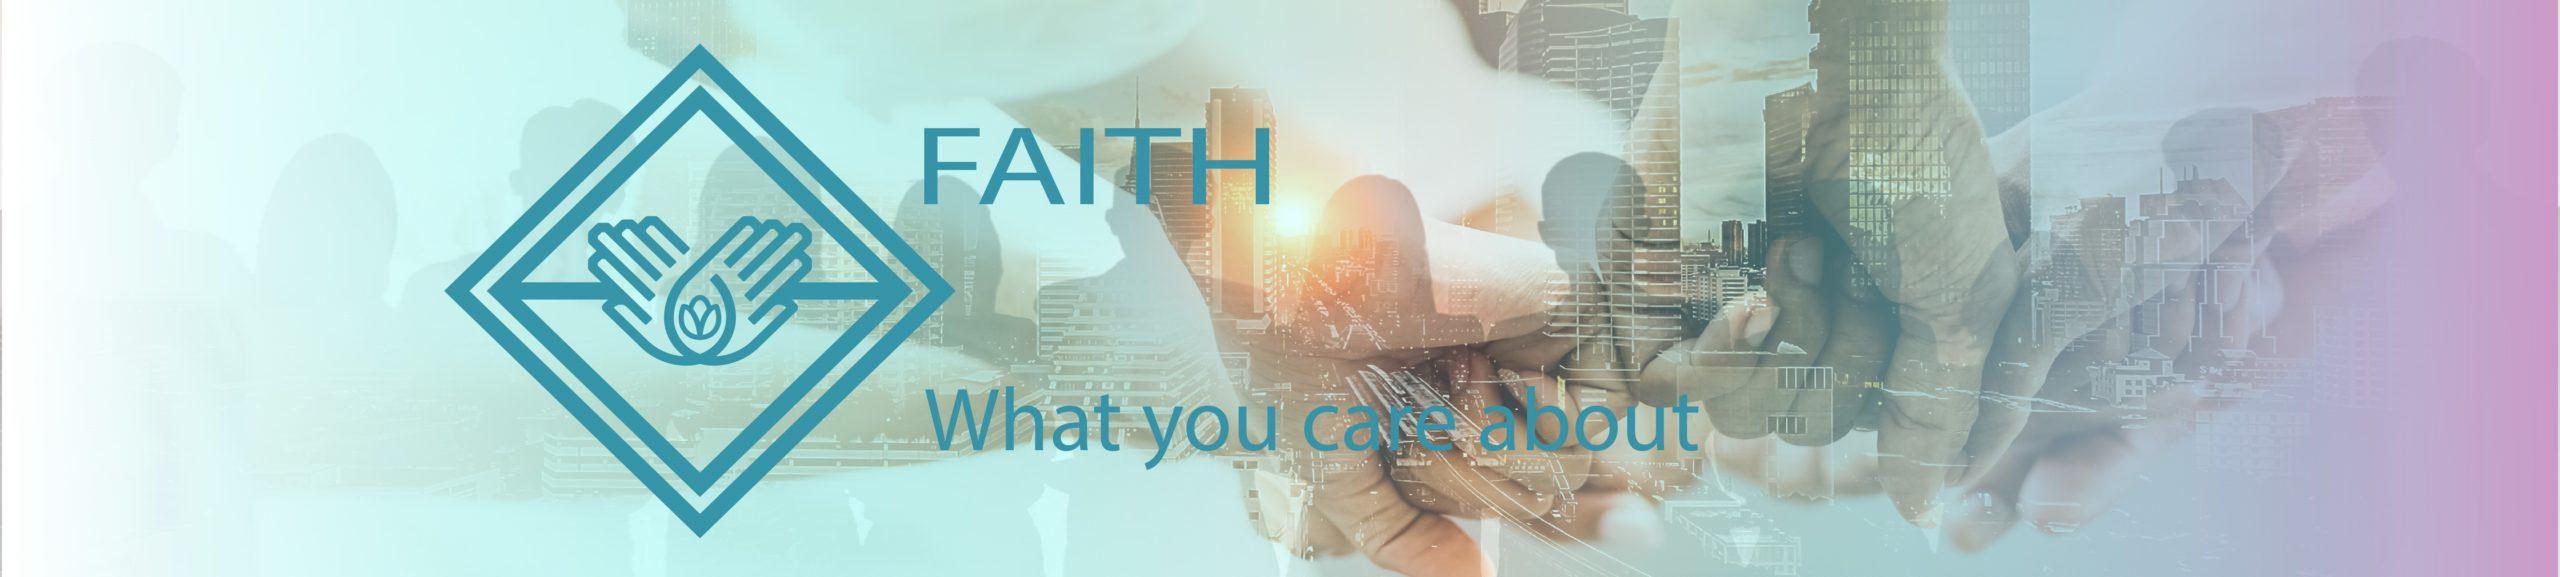 Sport FAITH Picture1